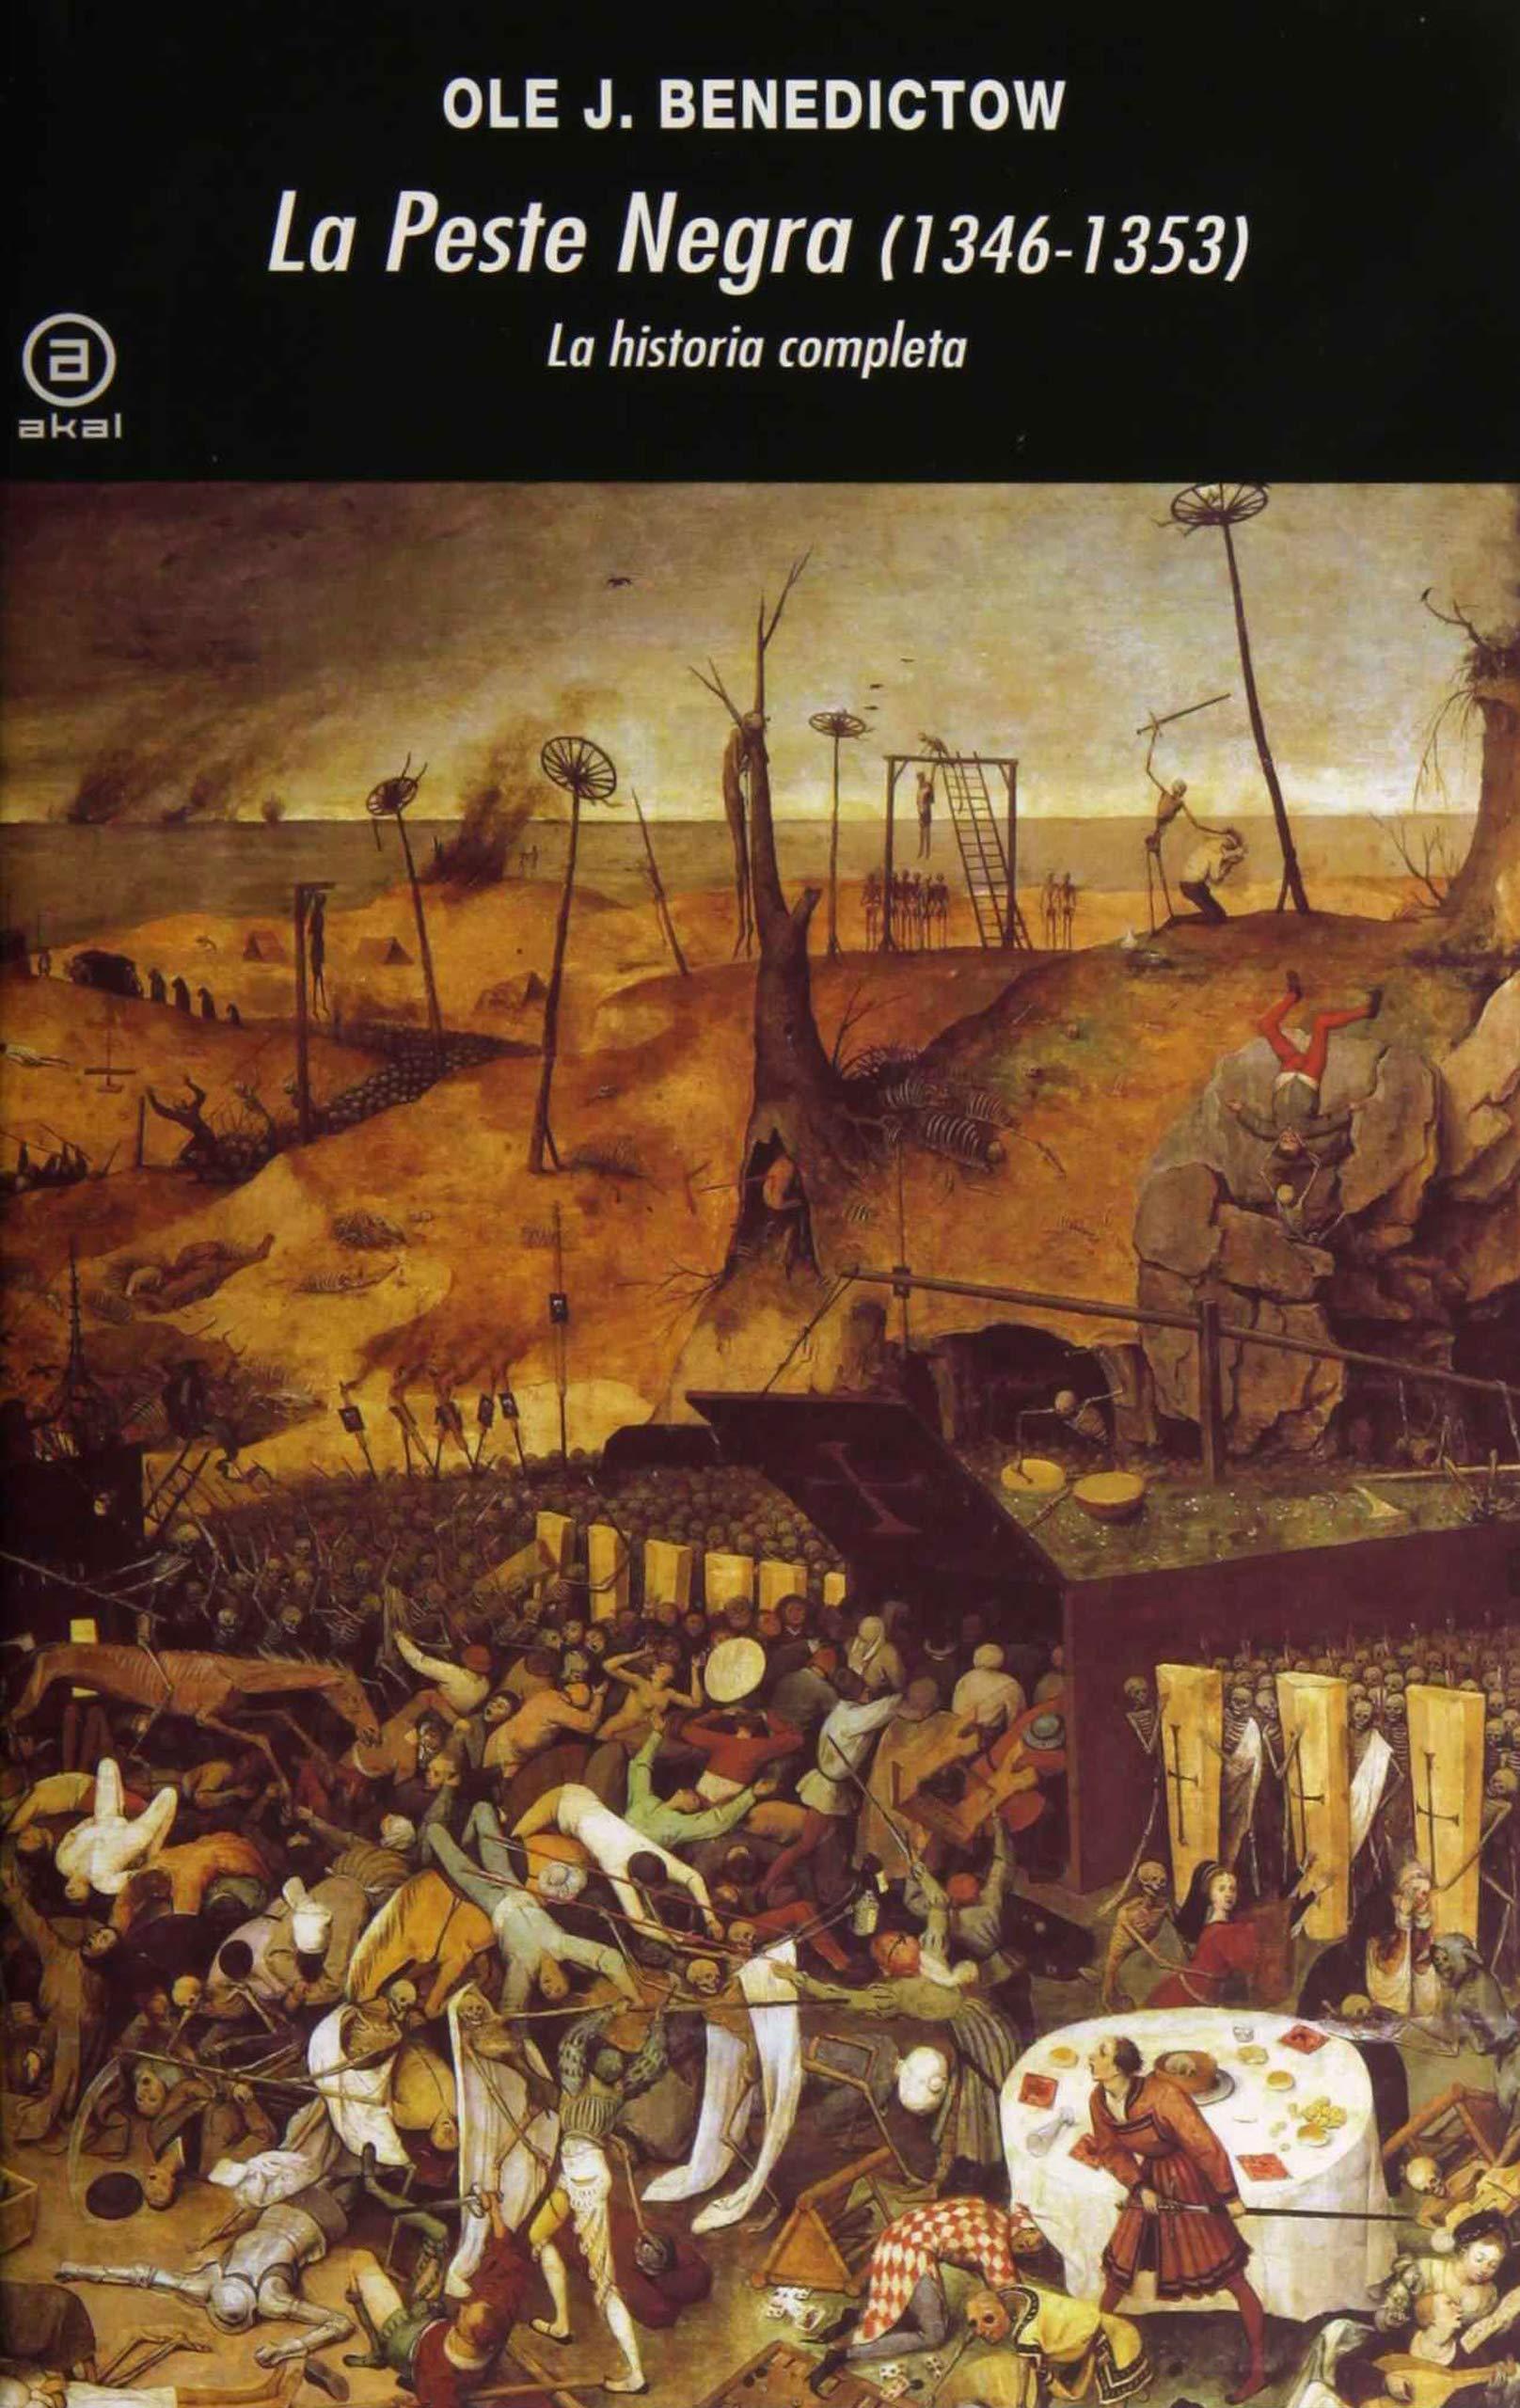 La Peste Negra, 1346-1353: La historia completa Universitaria: Amazon.es: Benedictow, Ole J., Gil Aristu, José Luis: Libros